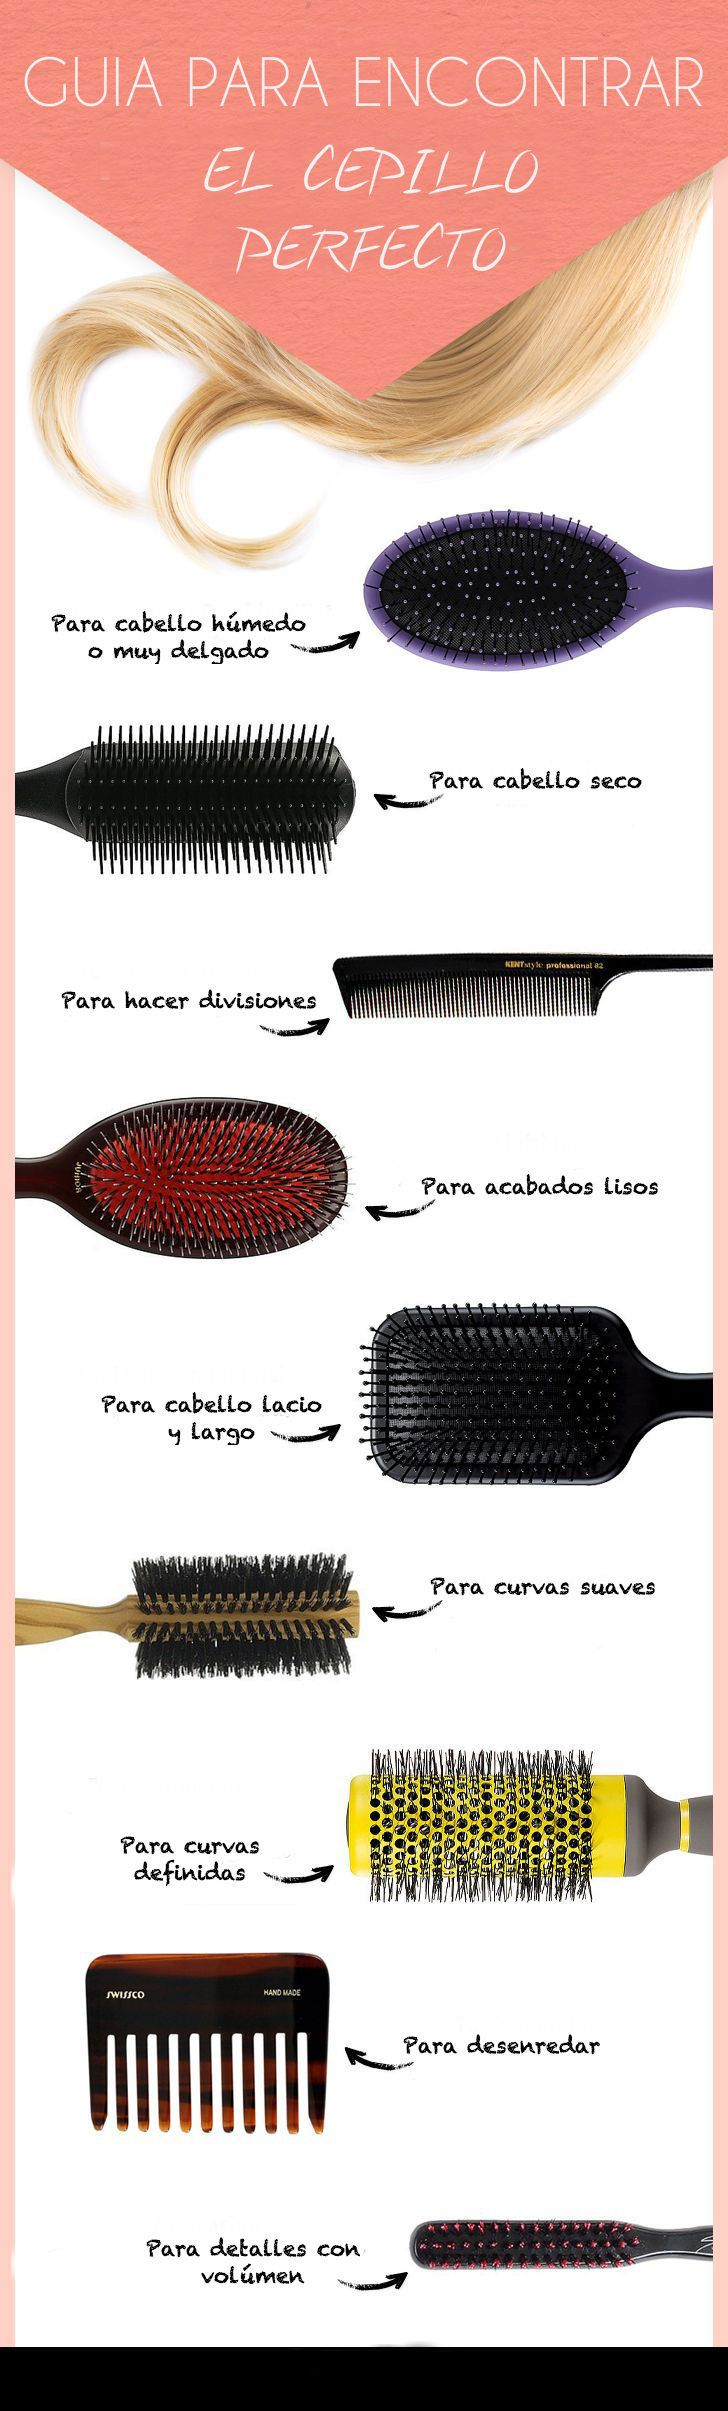 Cuidar los detalles, para cuidar tu cabellera. #YoSoyImpuls